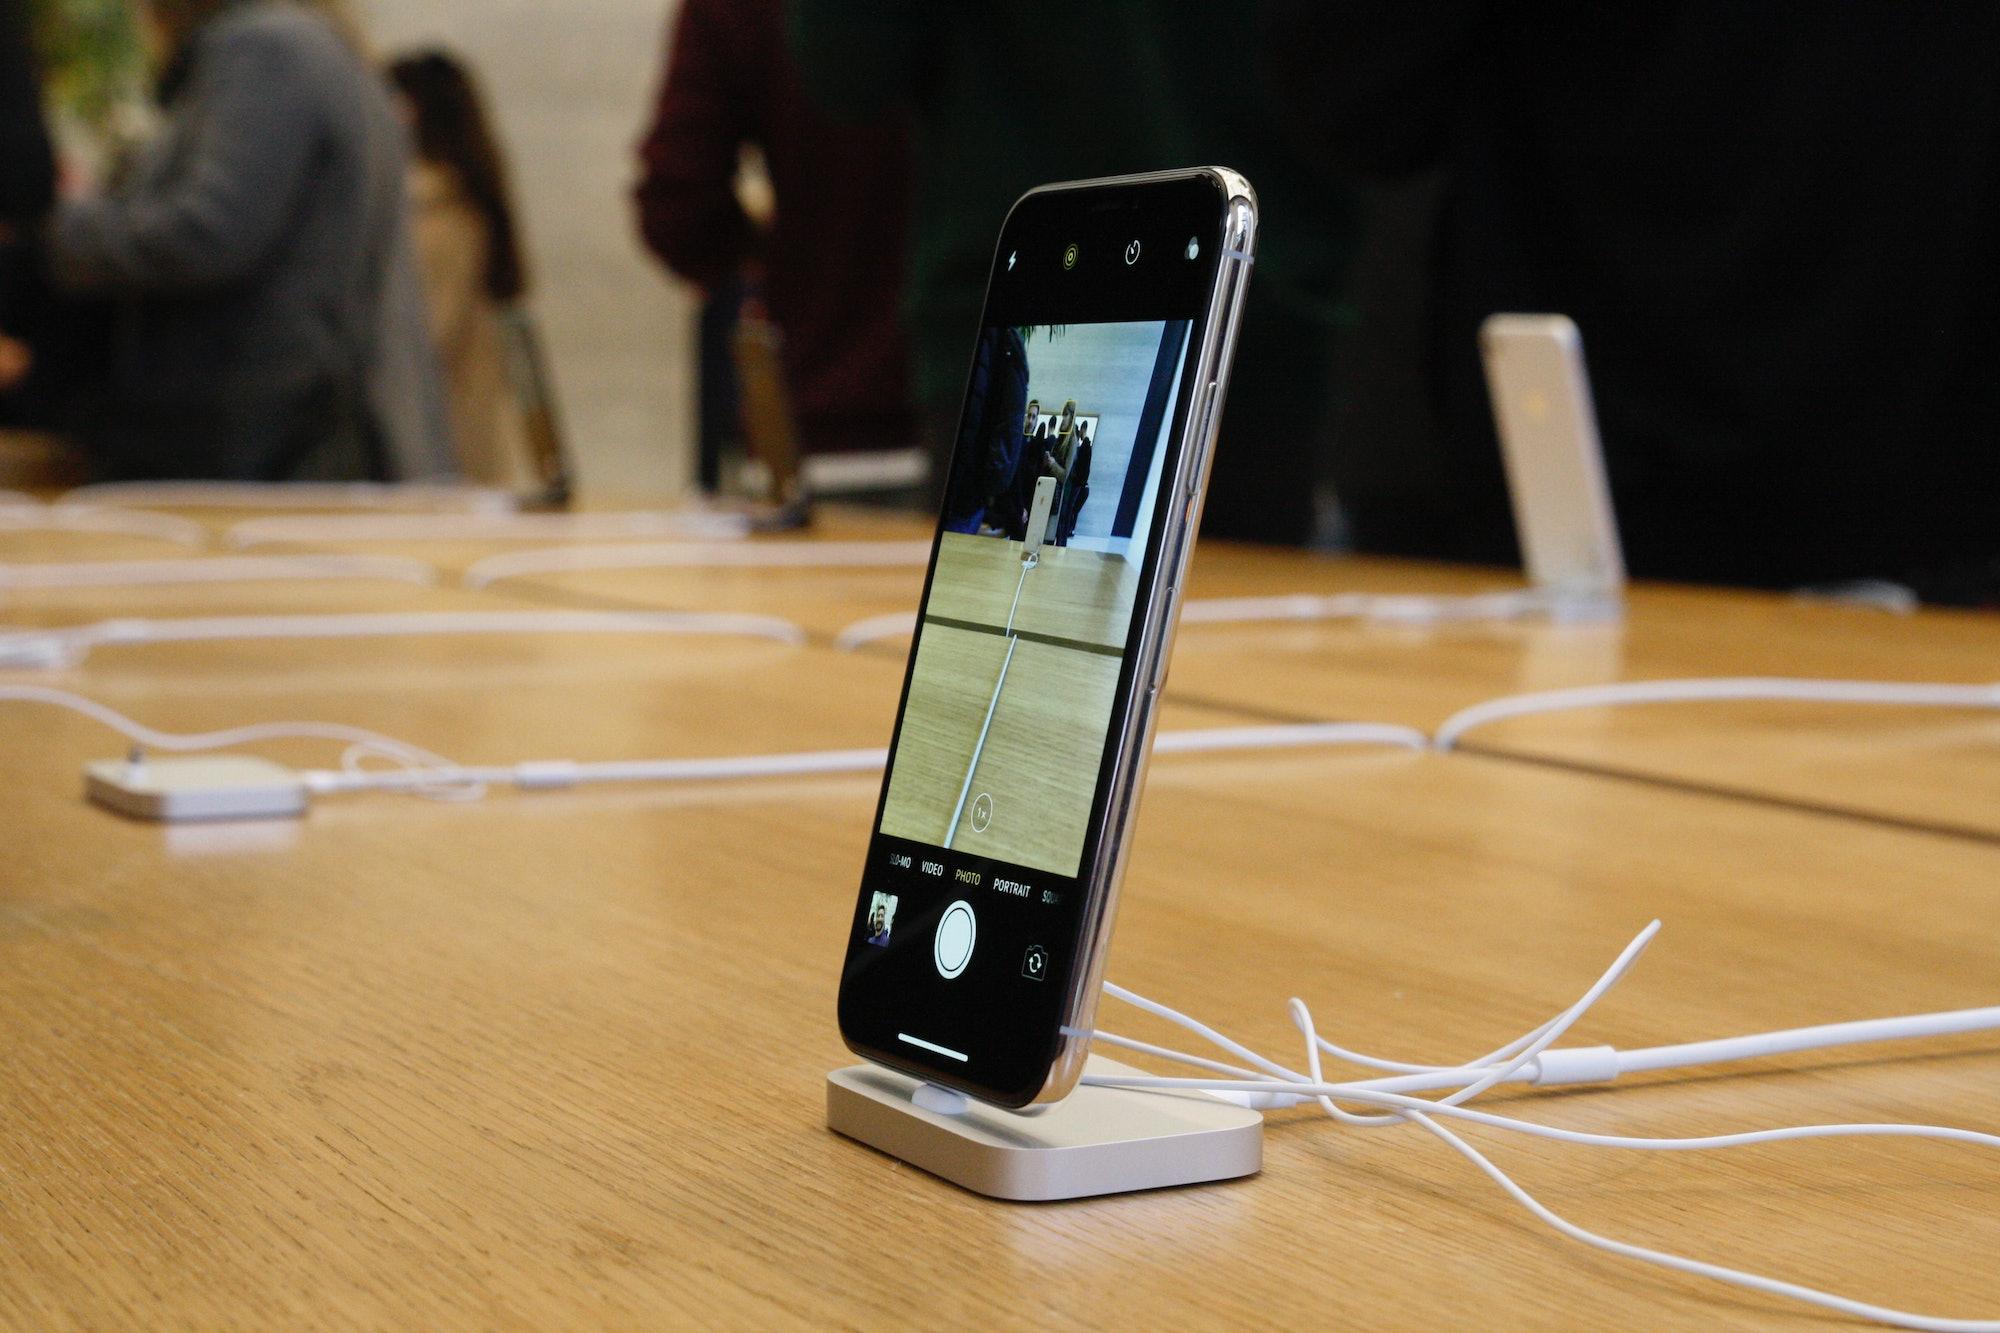 The iPhone X on display.